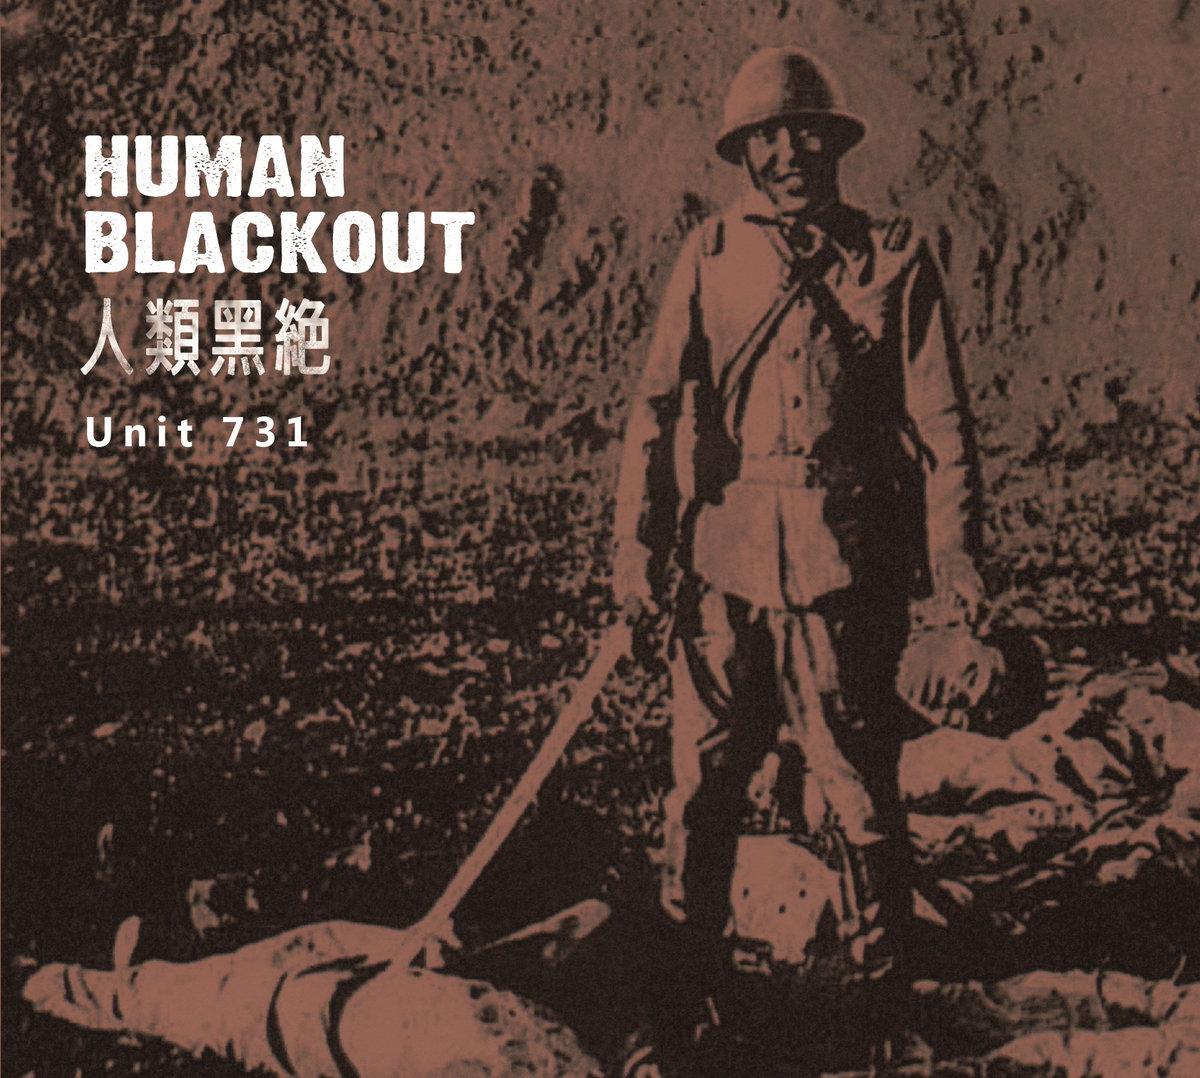 by Human Blackout